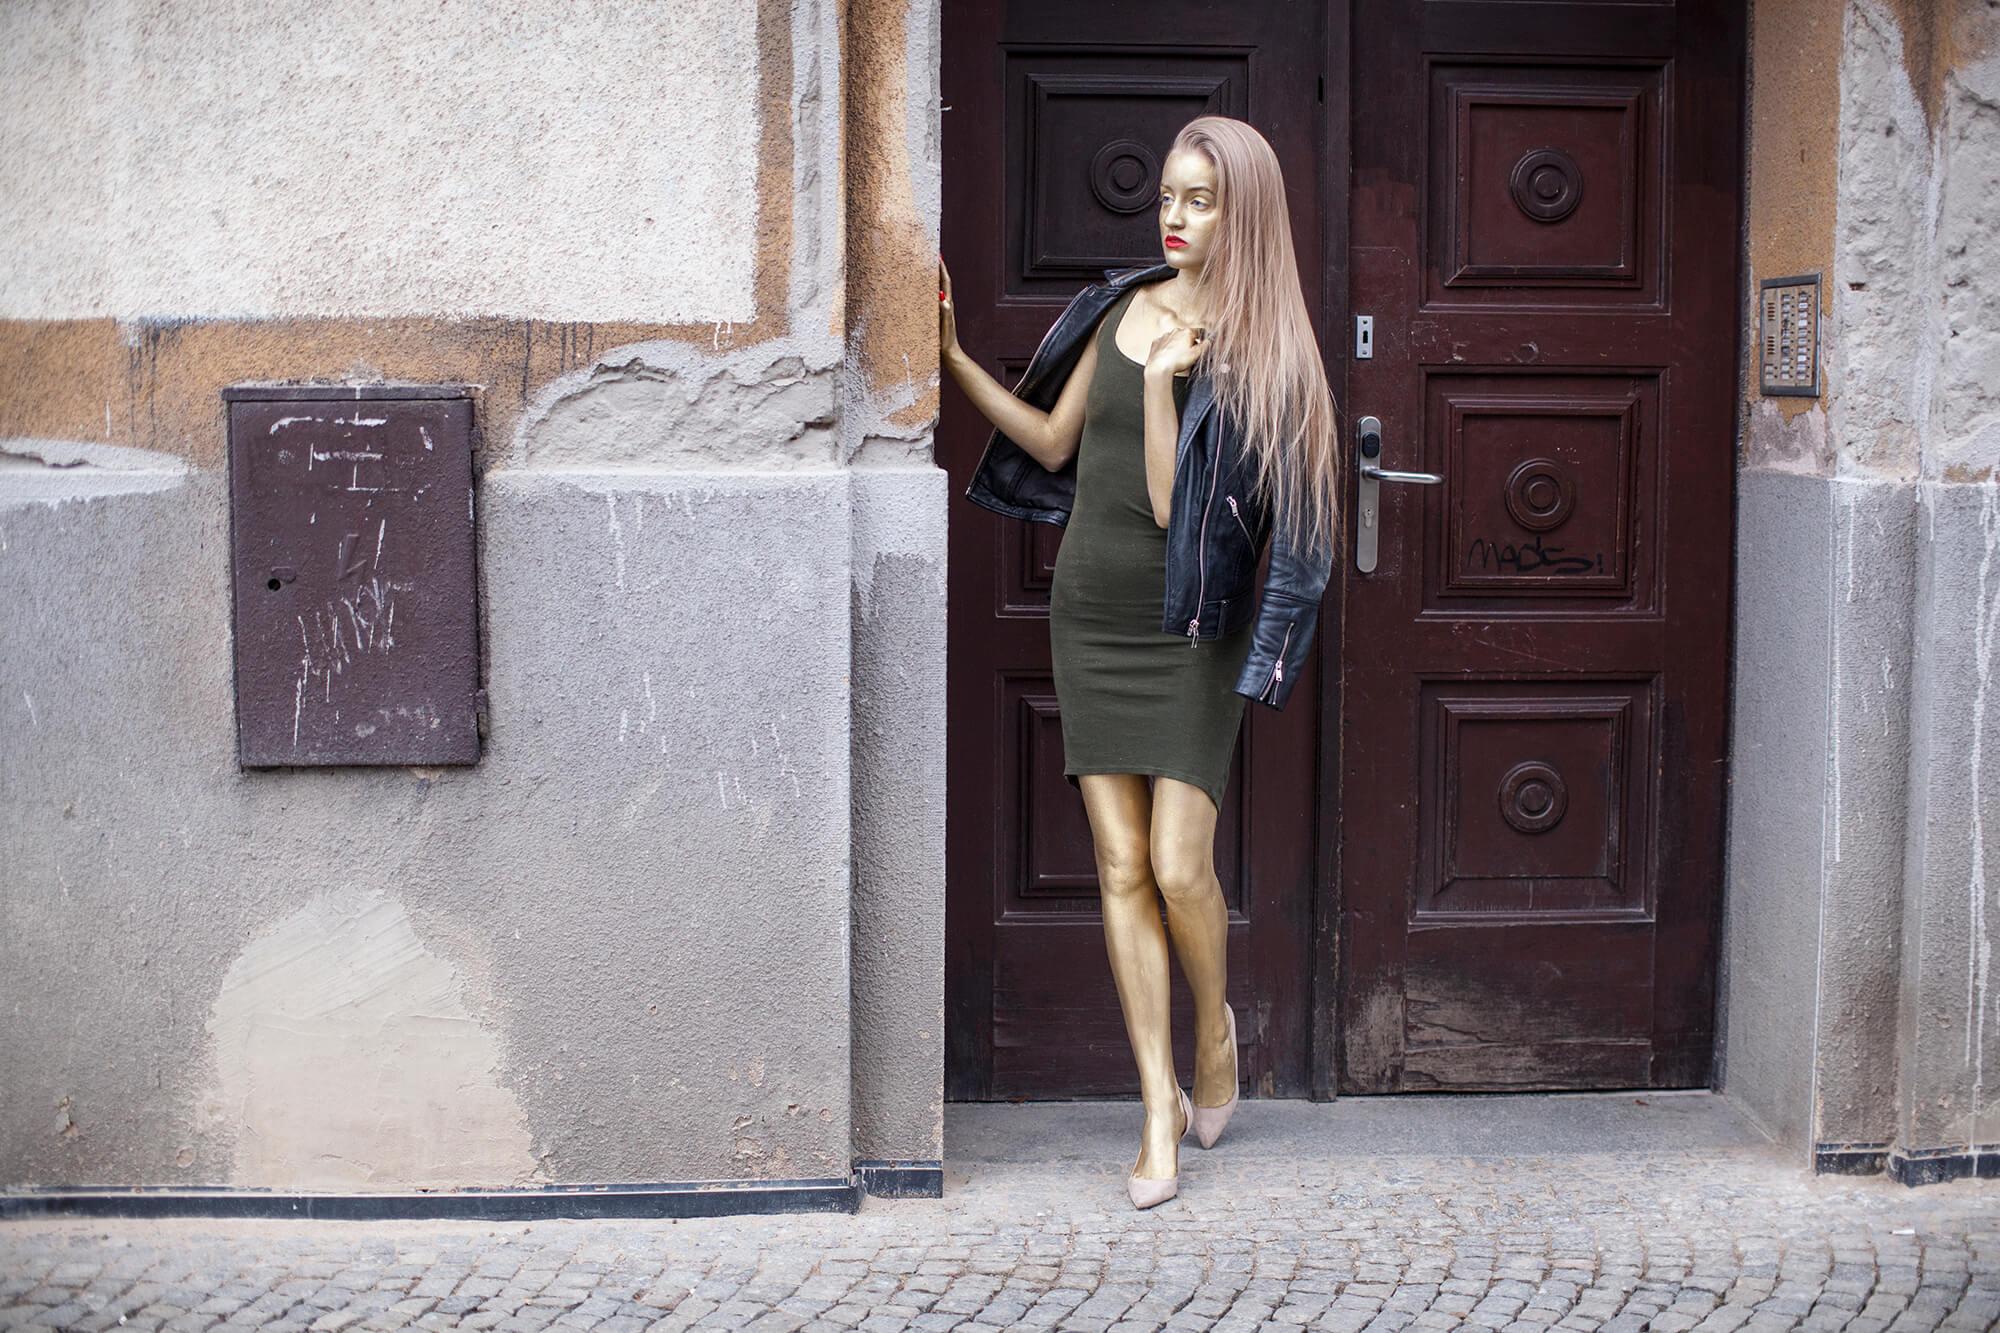 Golden girl by Shalev Man vs